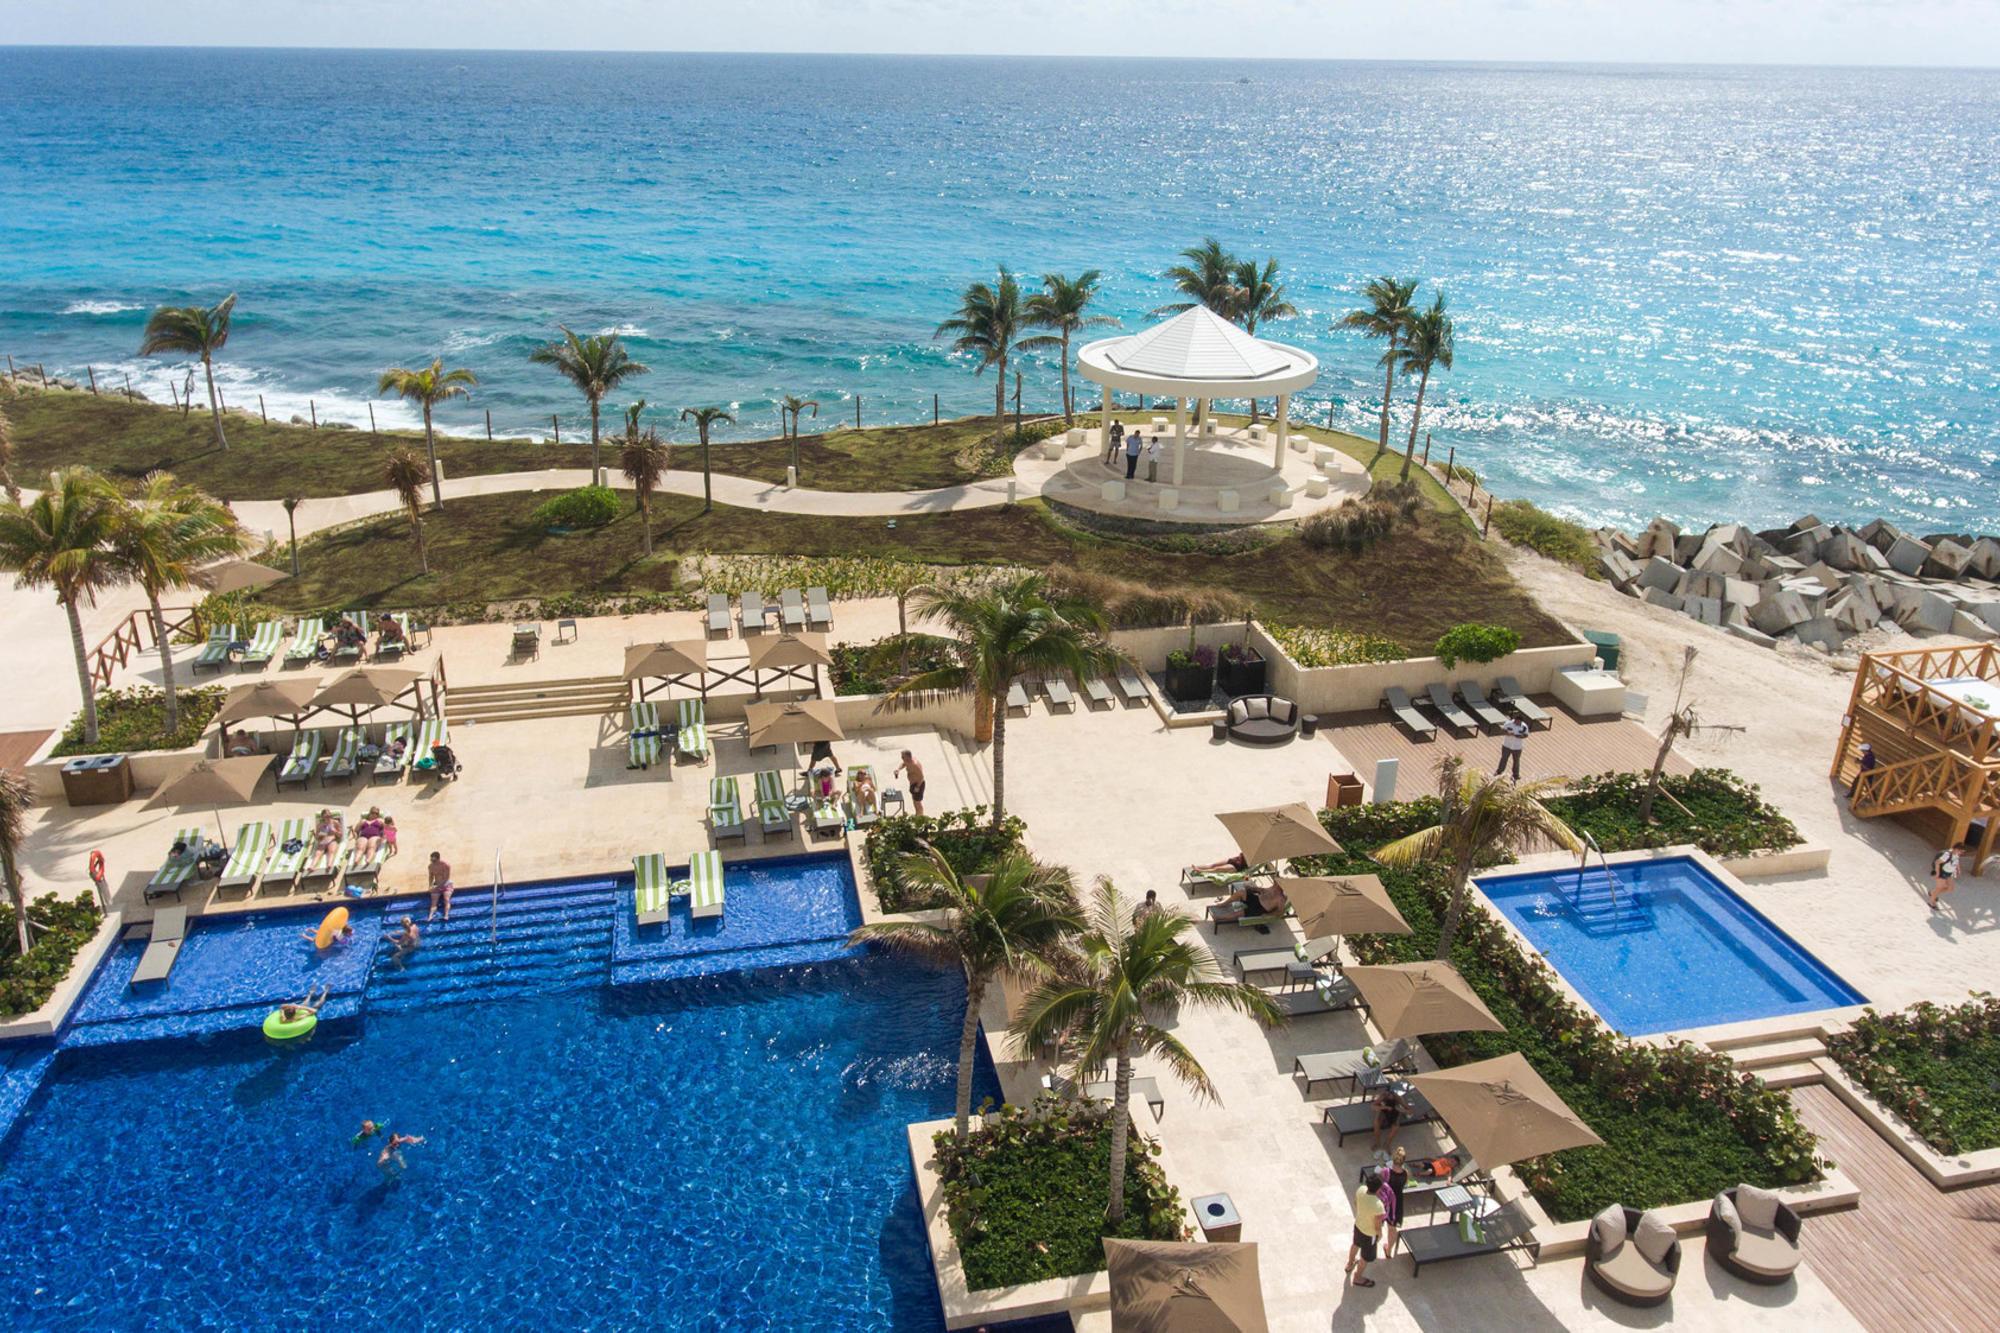 Hyatt Ziva Cancun/Oyster